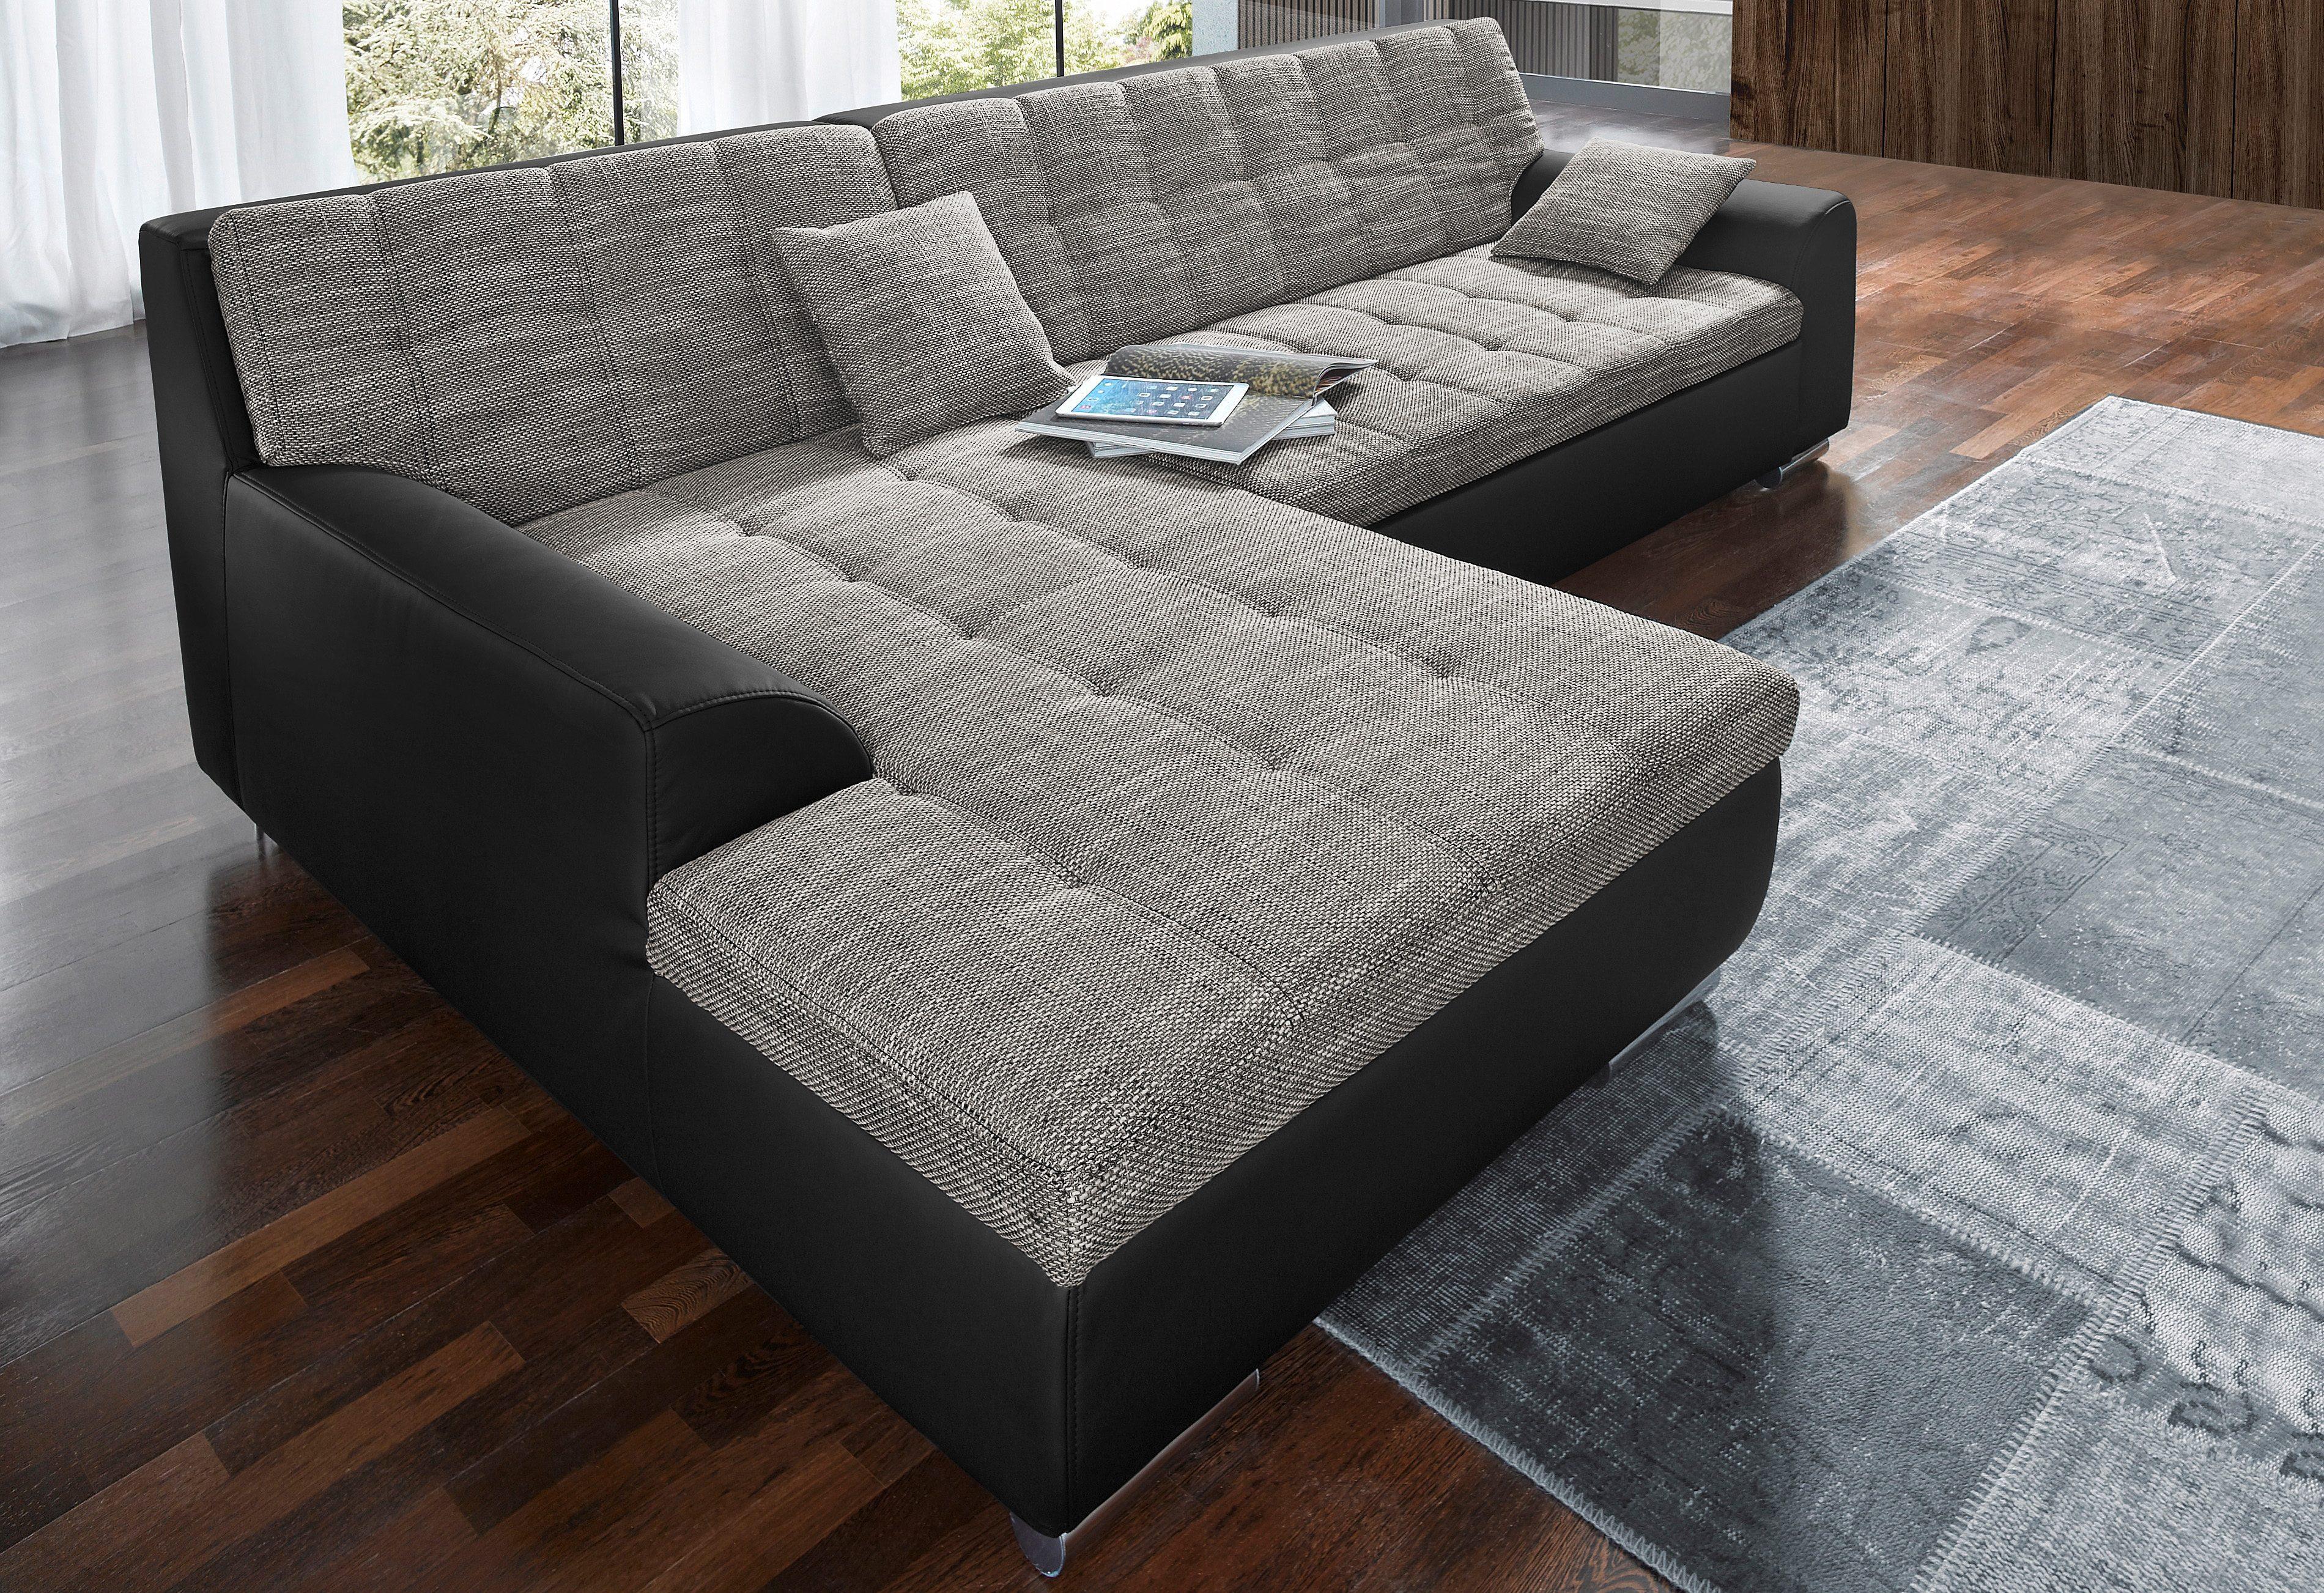 Xxl KaufenOtto Online Couch KaufenOtto Sofaamp; Online Xxl Couch Online Xxl Couch Sofaamp; Sofaamp; Okw0nP